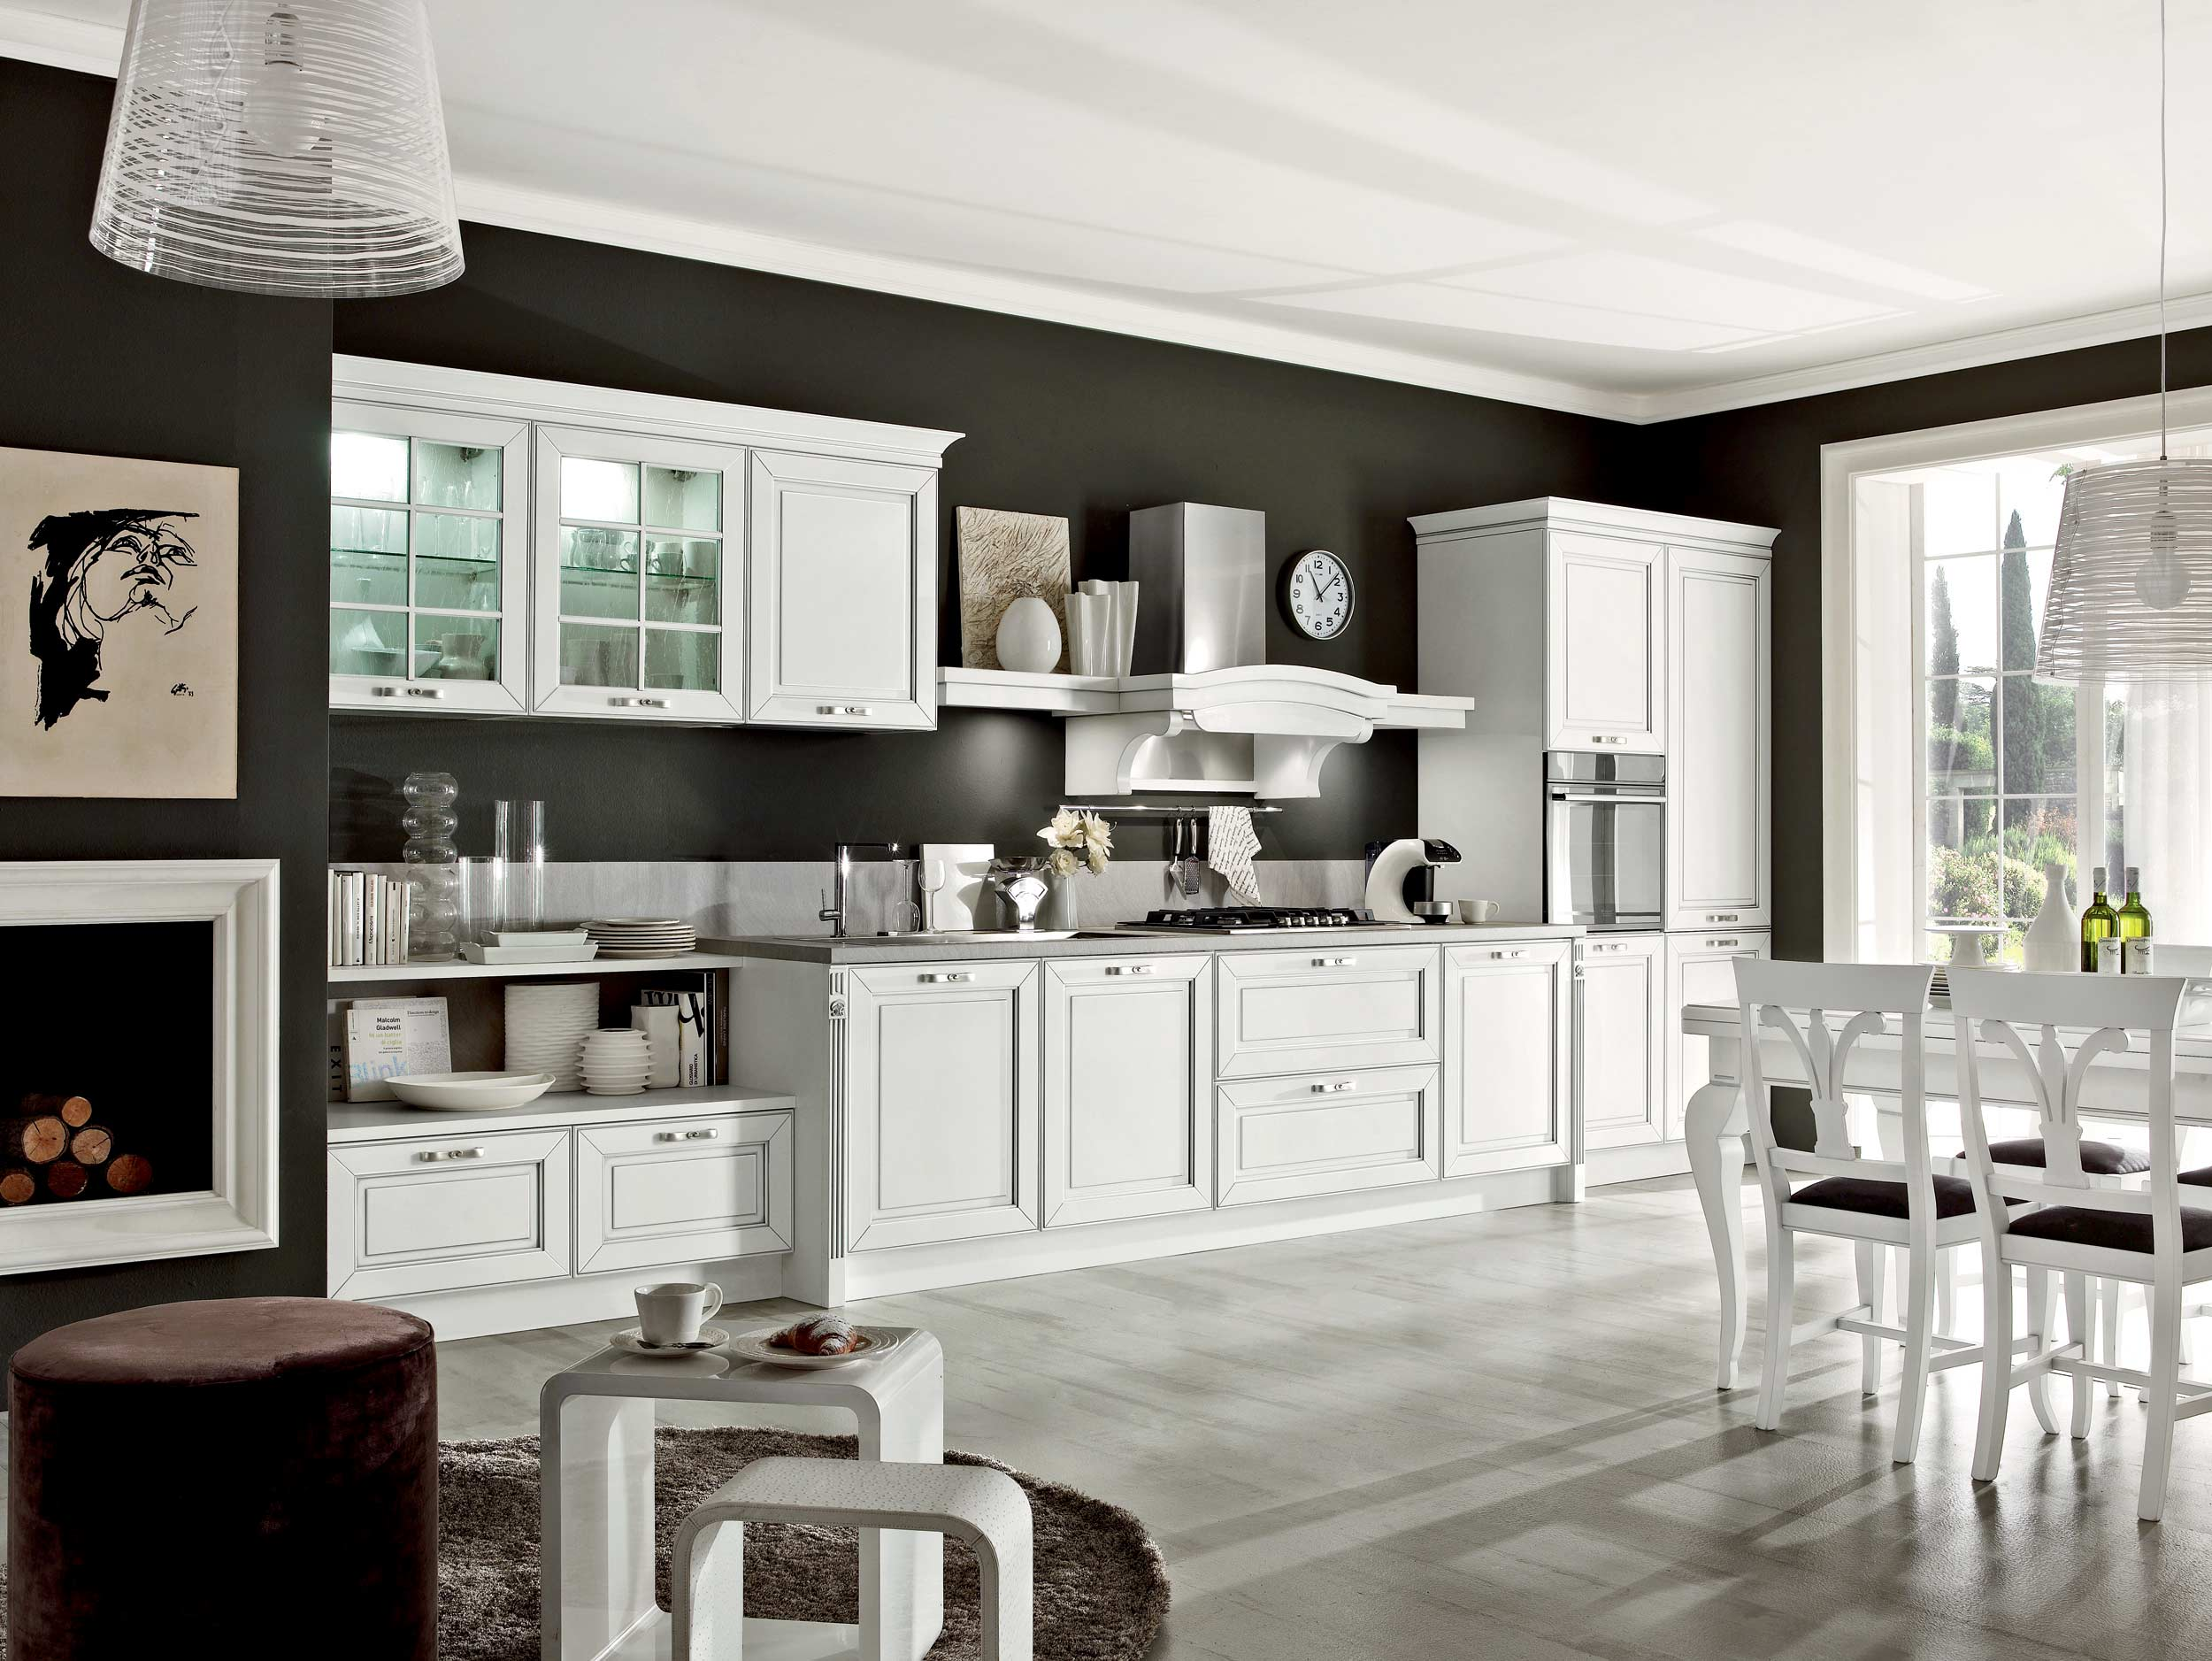 Awesome Cucina Stile Barocco Contemporary - Acomo.us - acomo.us